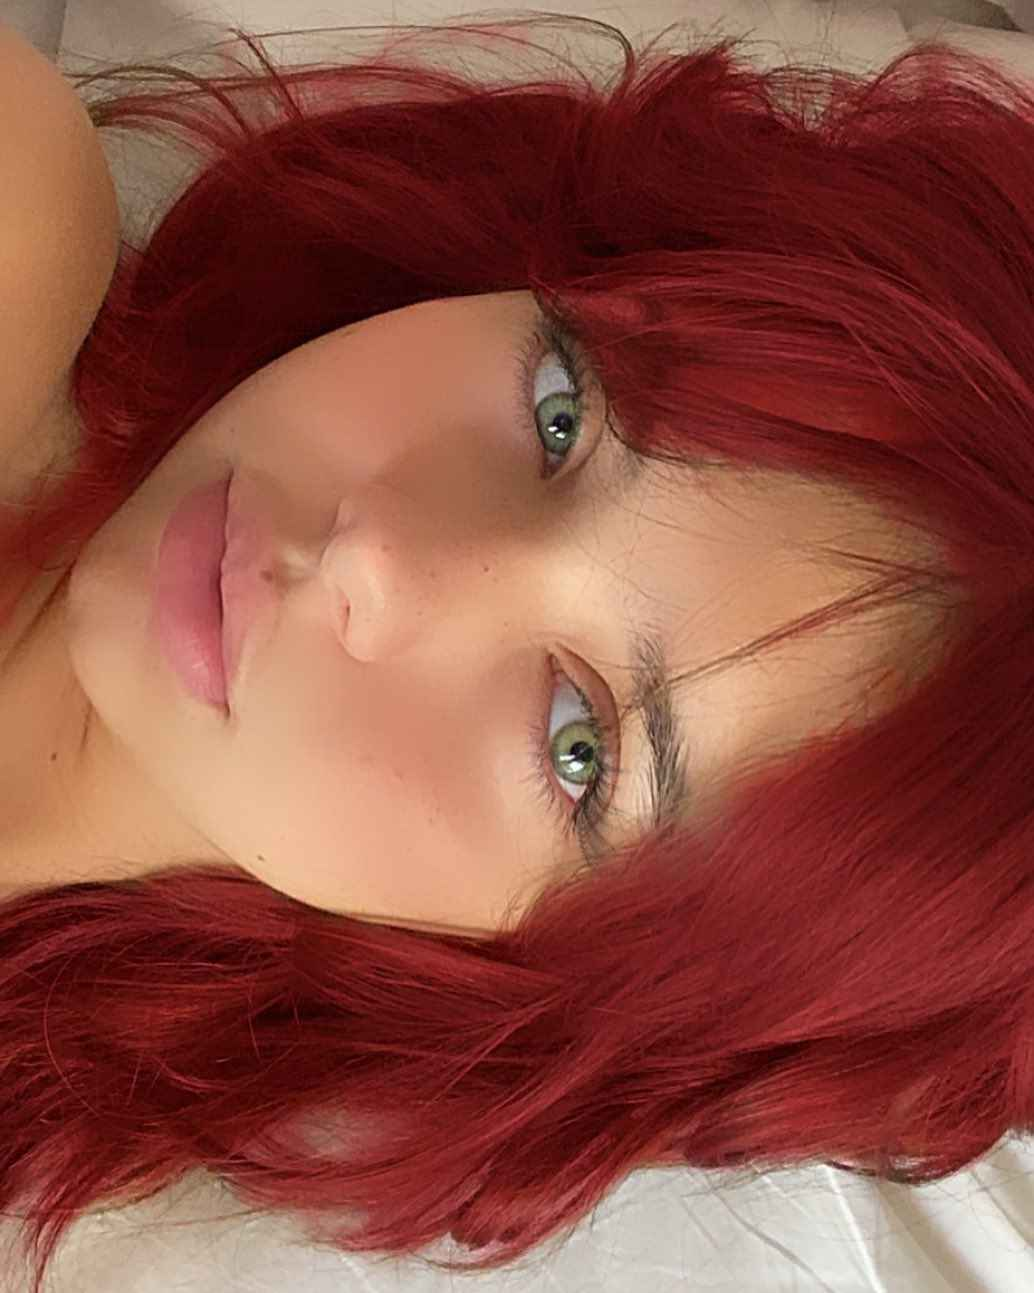 Valentina image, pic's